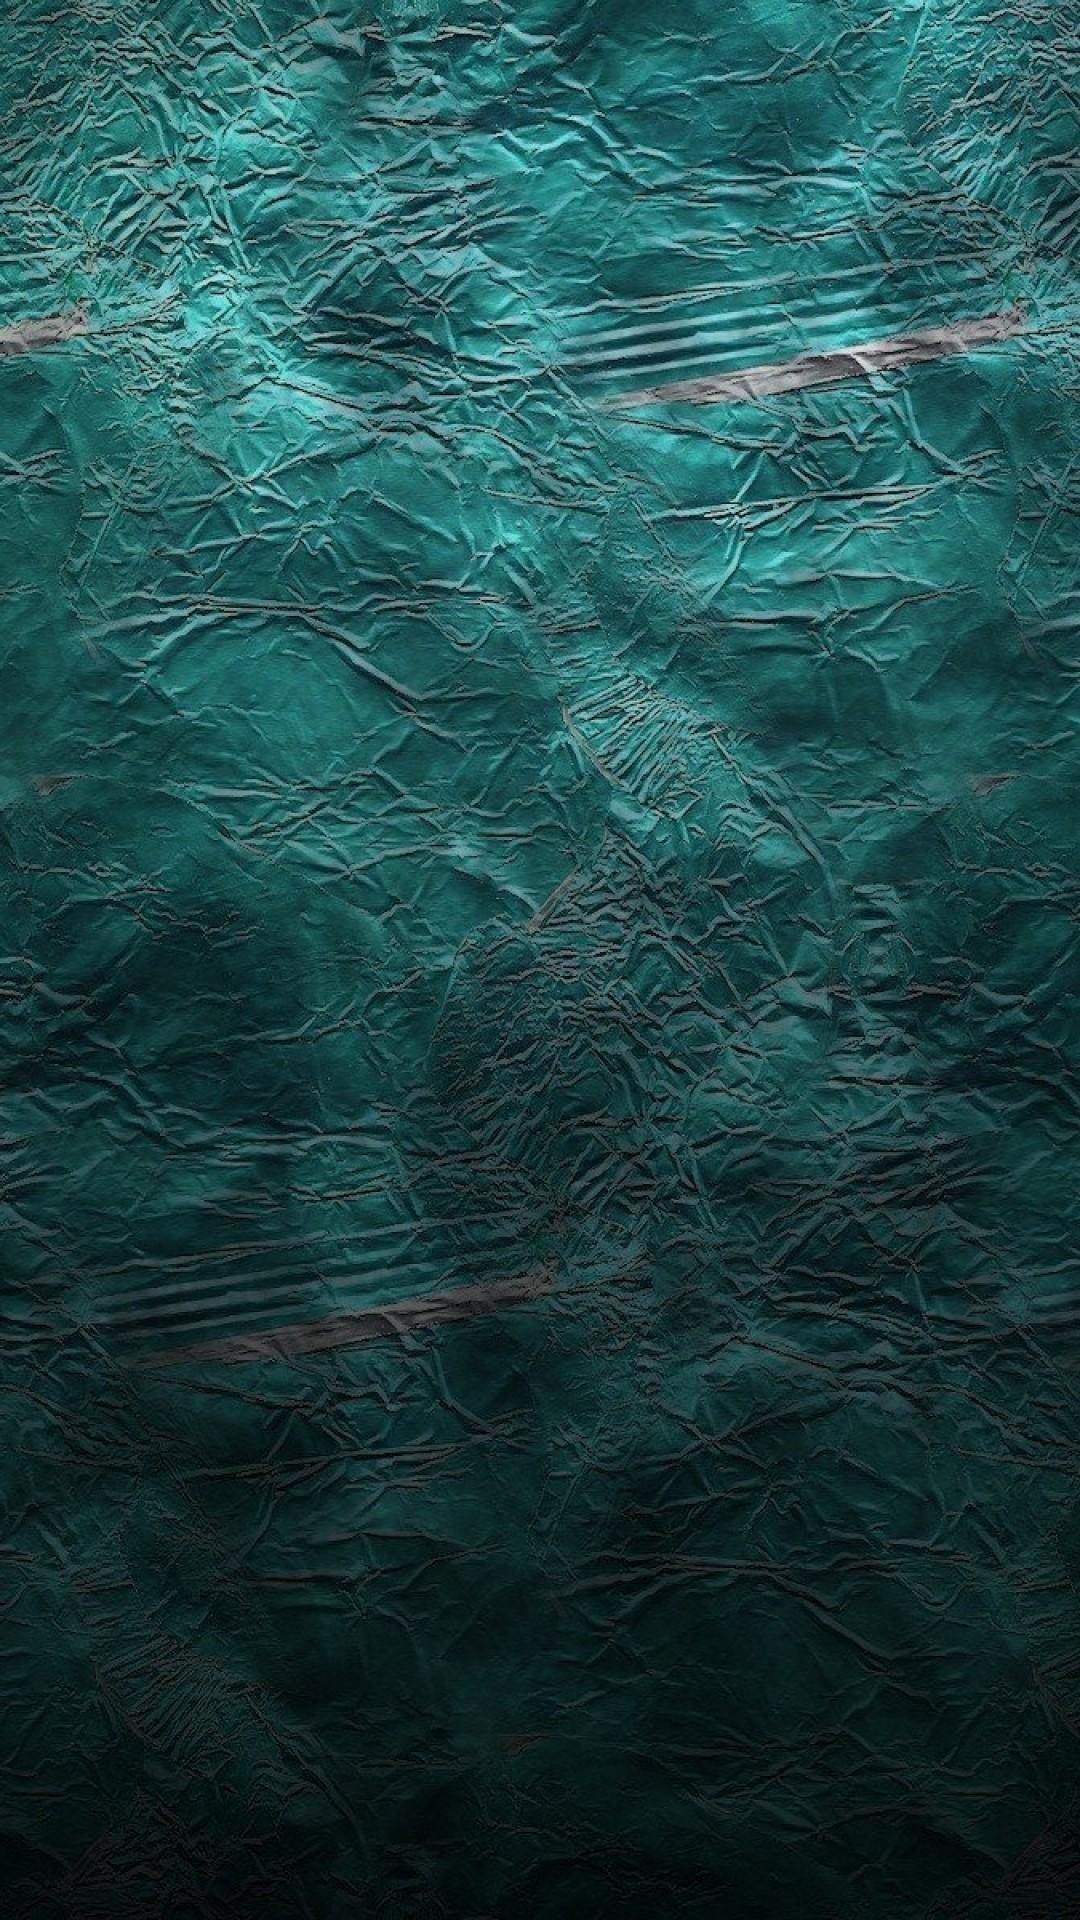 Grunge ios wallpaper